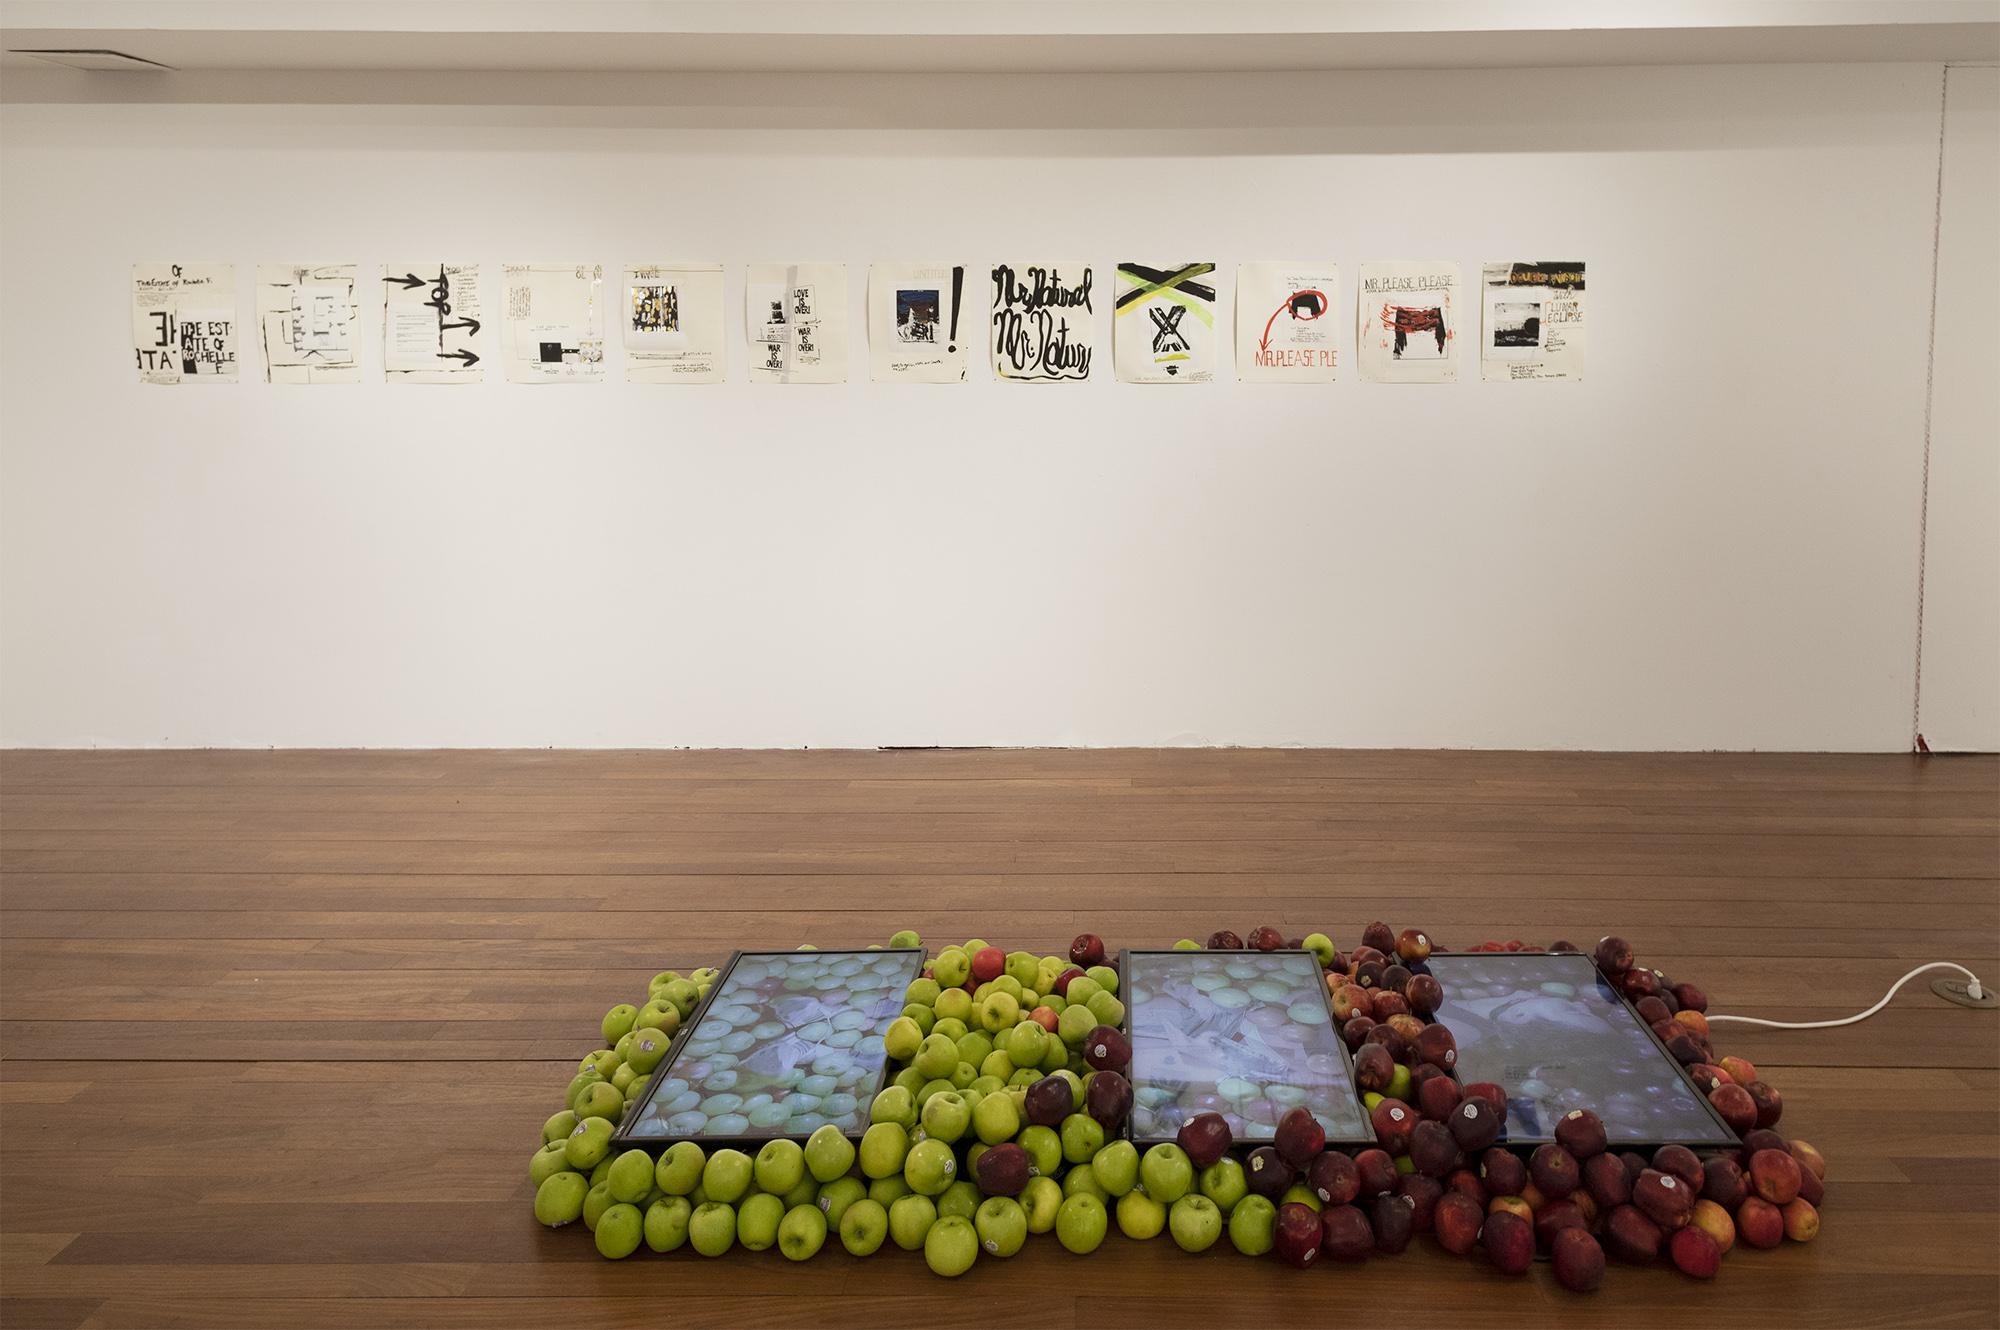 works by Aika Akhmetova, Rochelle Feinstein